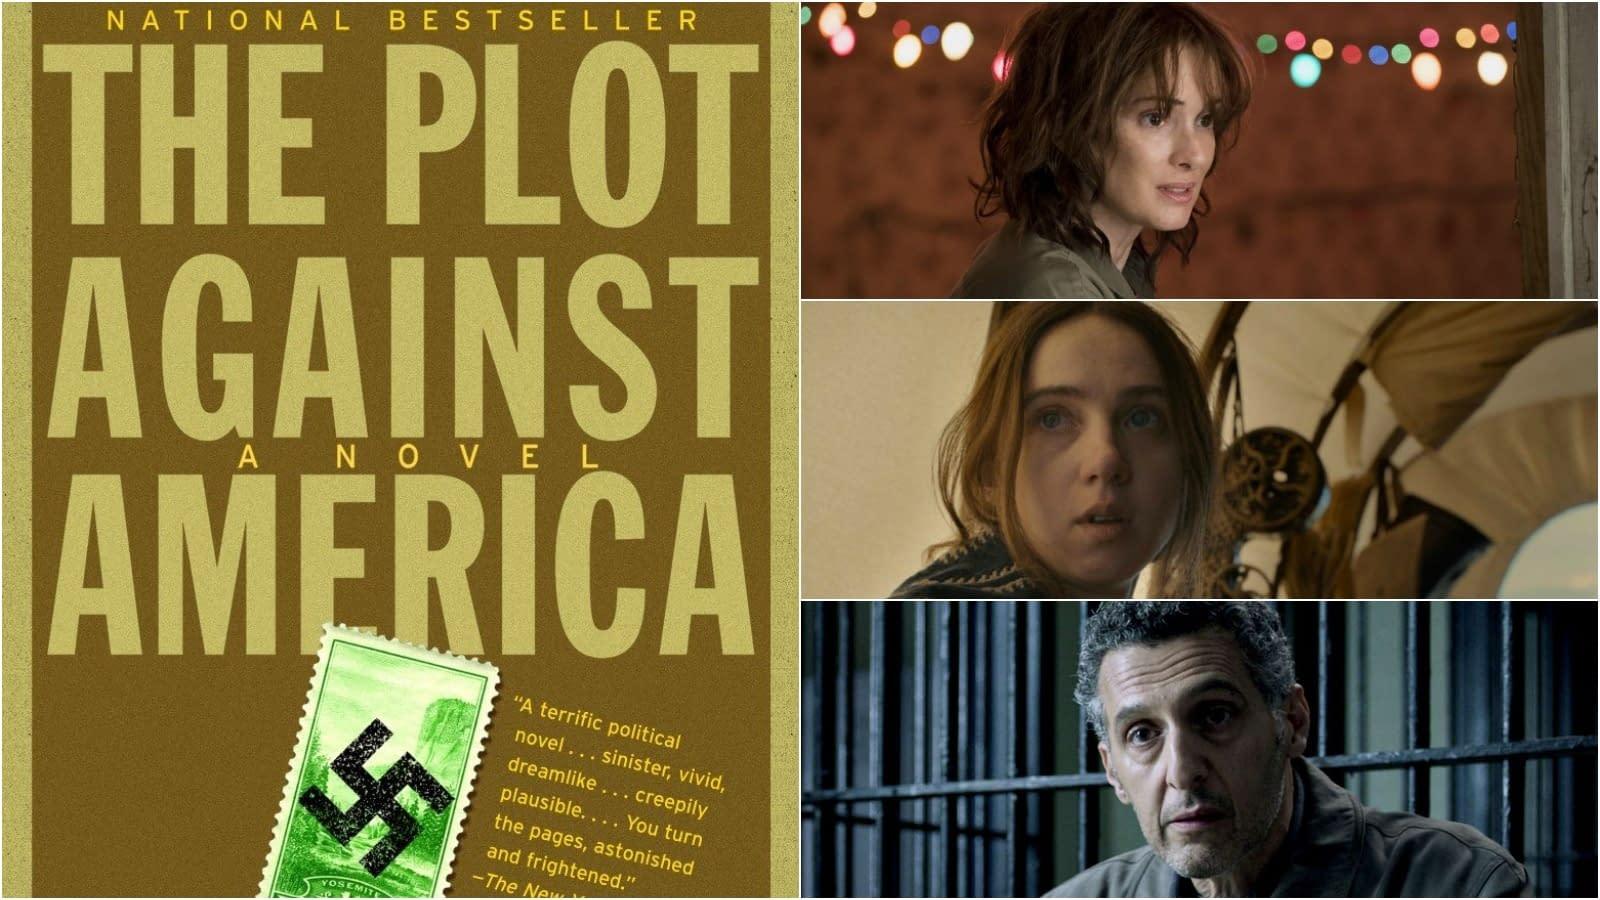 'The Plot Against America': Winona Ryder, Zoe Kazan, John Turturro, 4 More Join HBO Miniseries